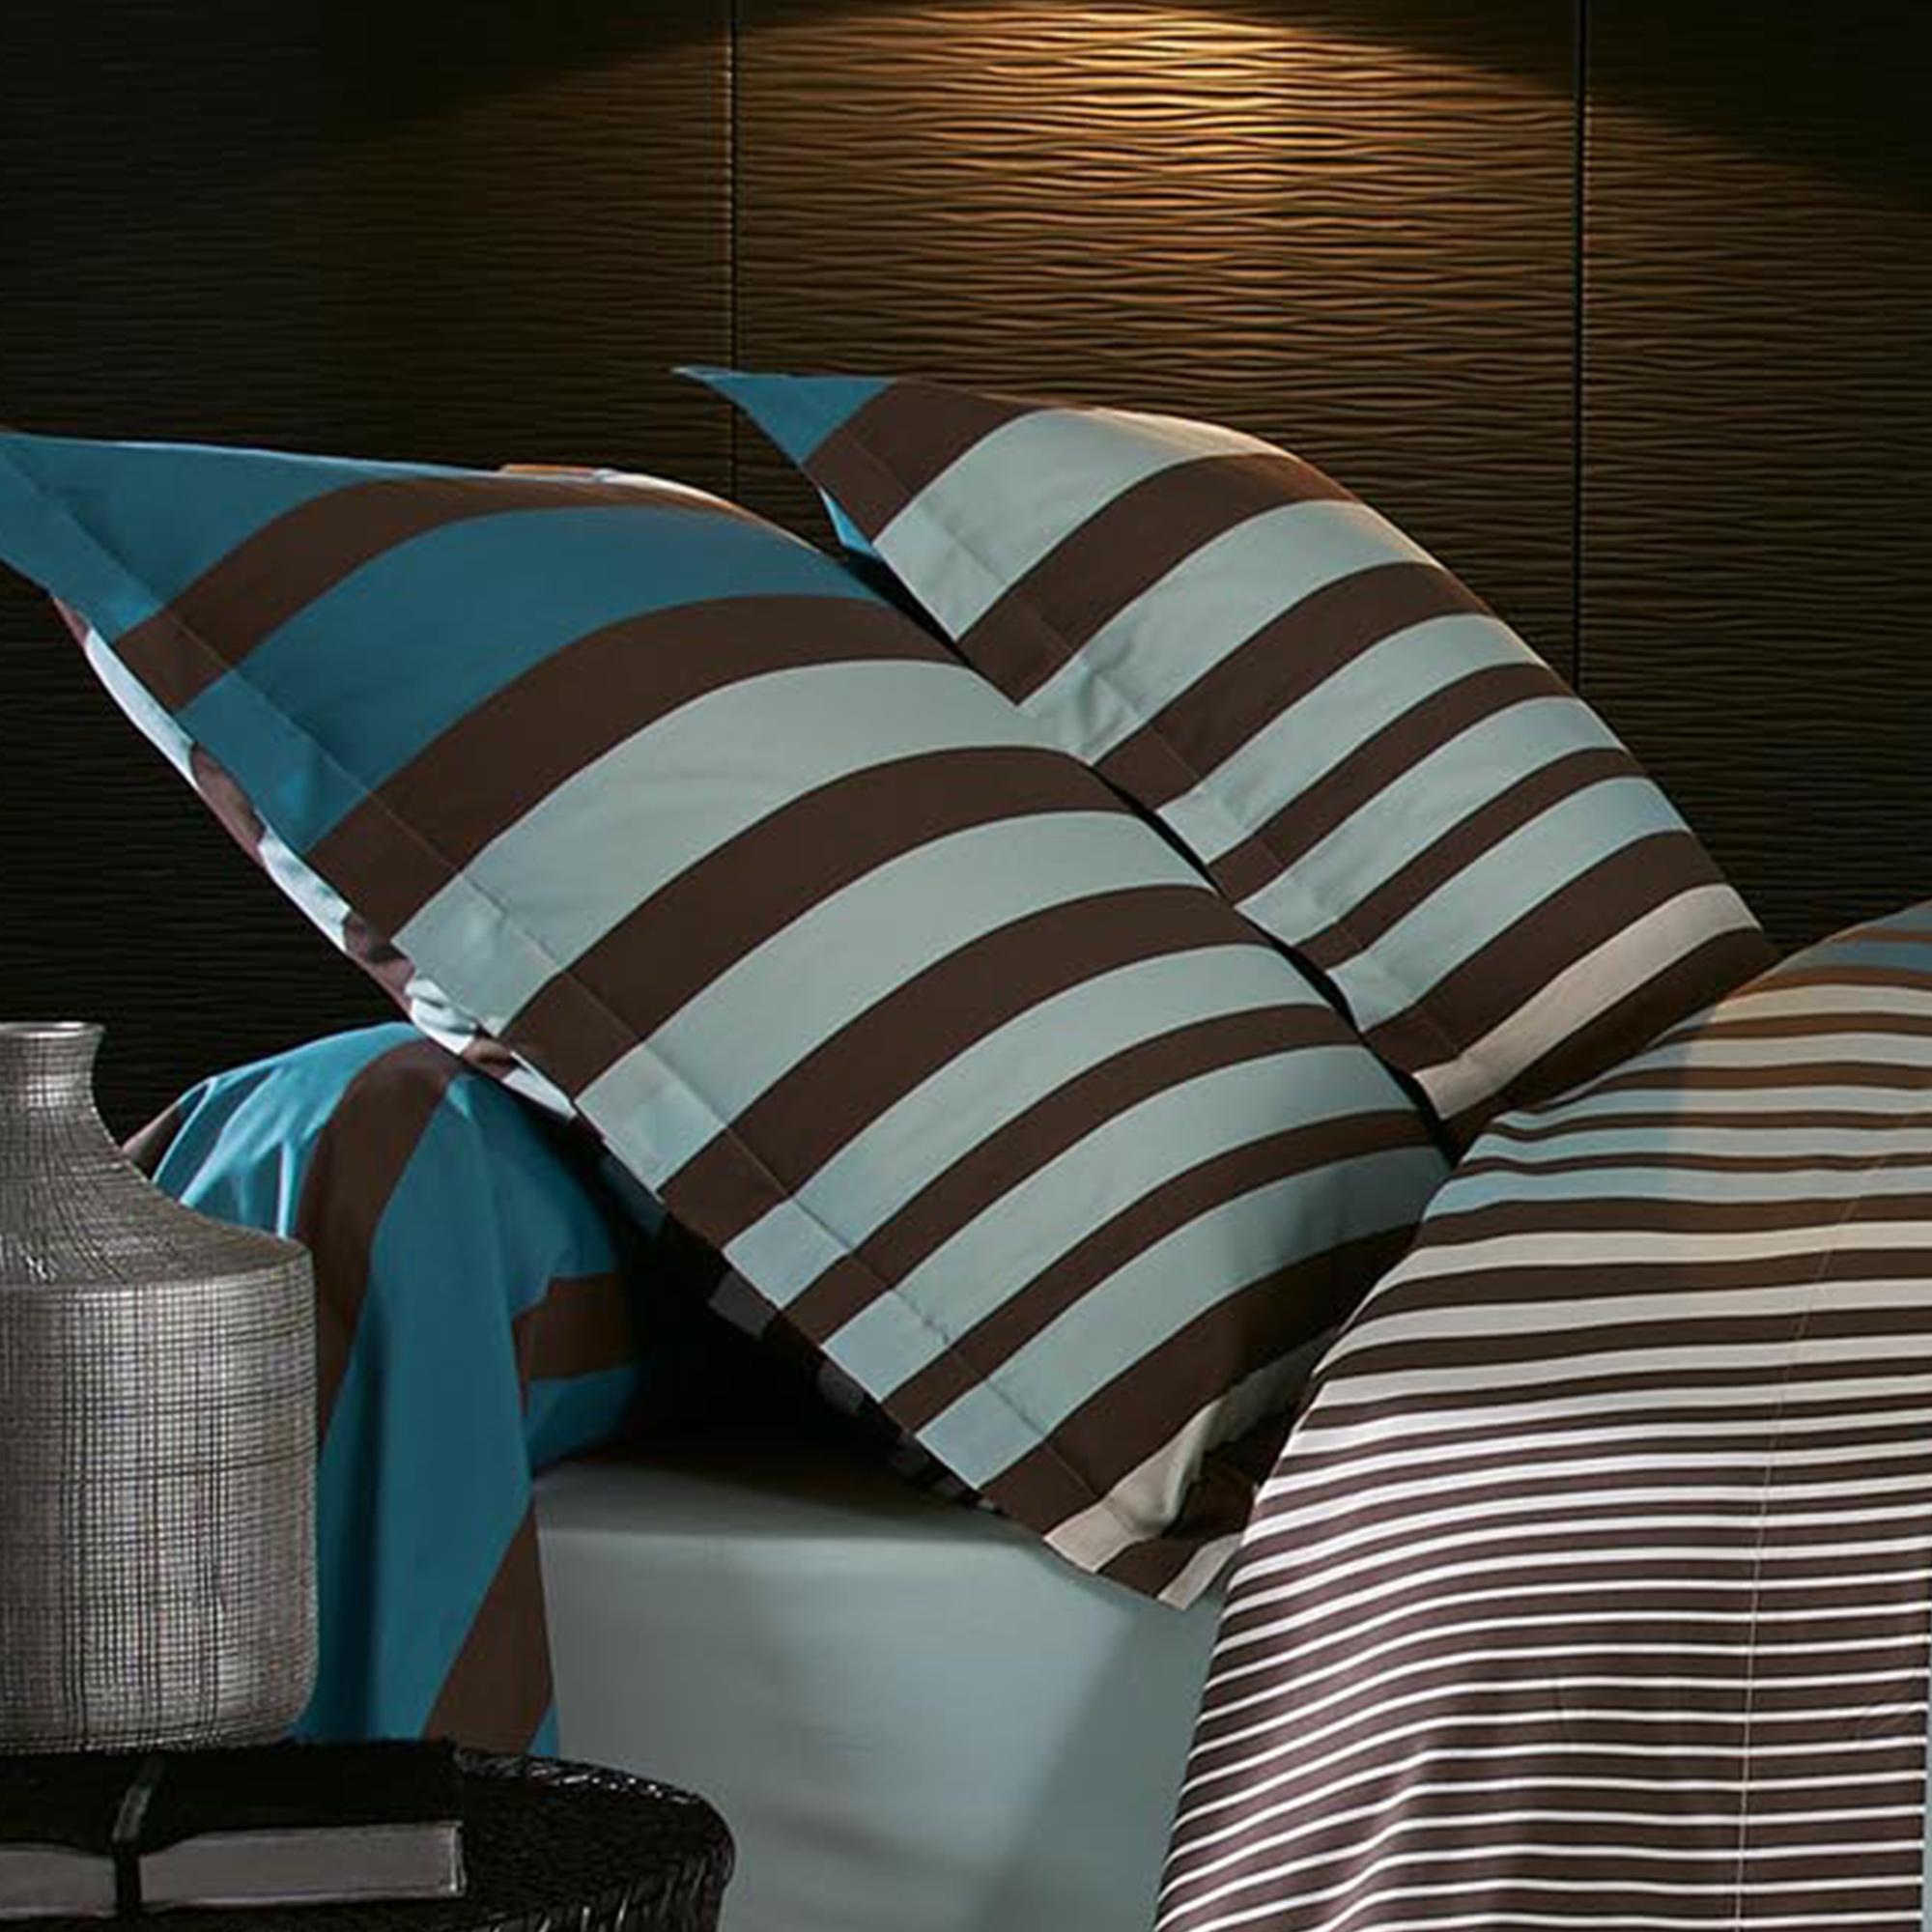 Taie d 39 oreiller percale pur coton peign 65x65 cm stripe - Taie d oreiller 65x65 ...